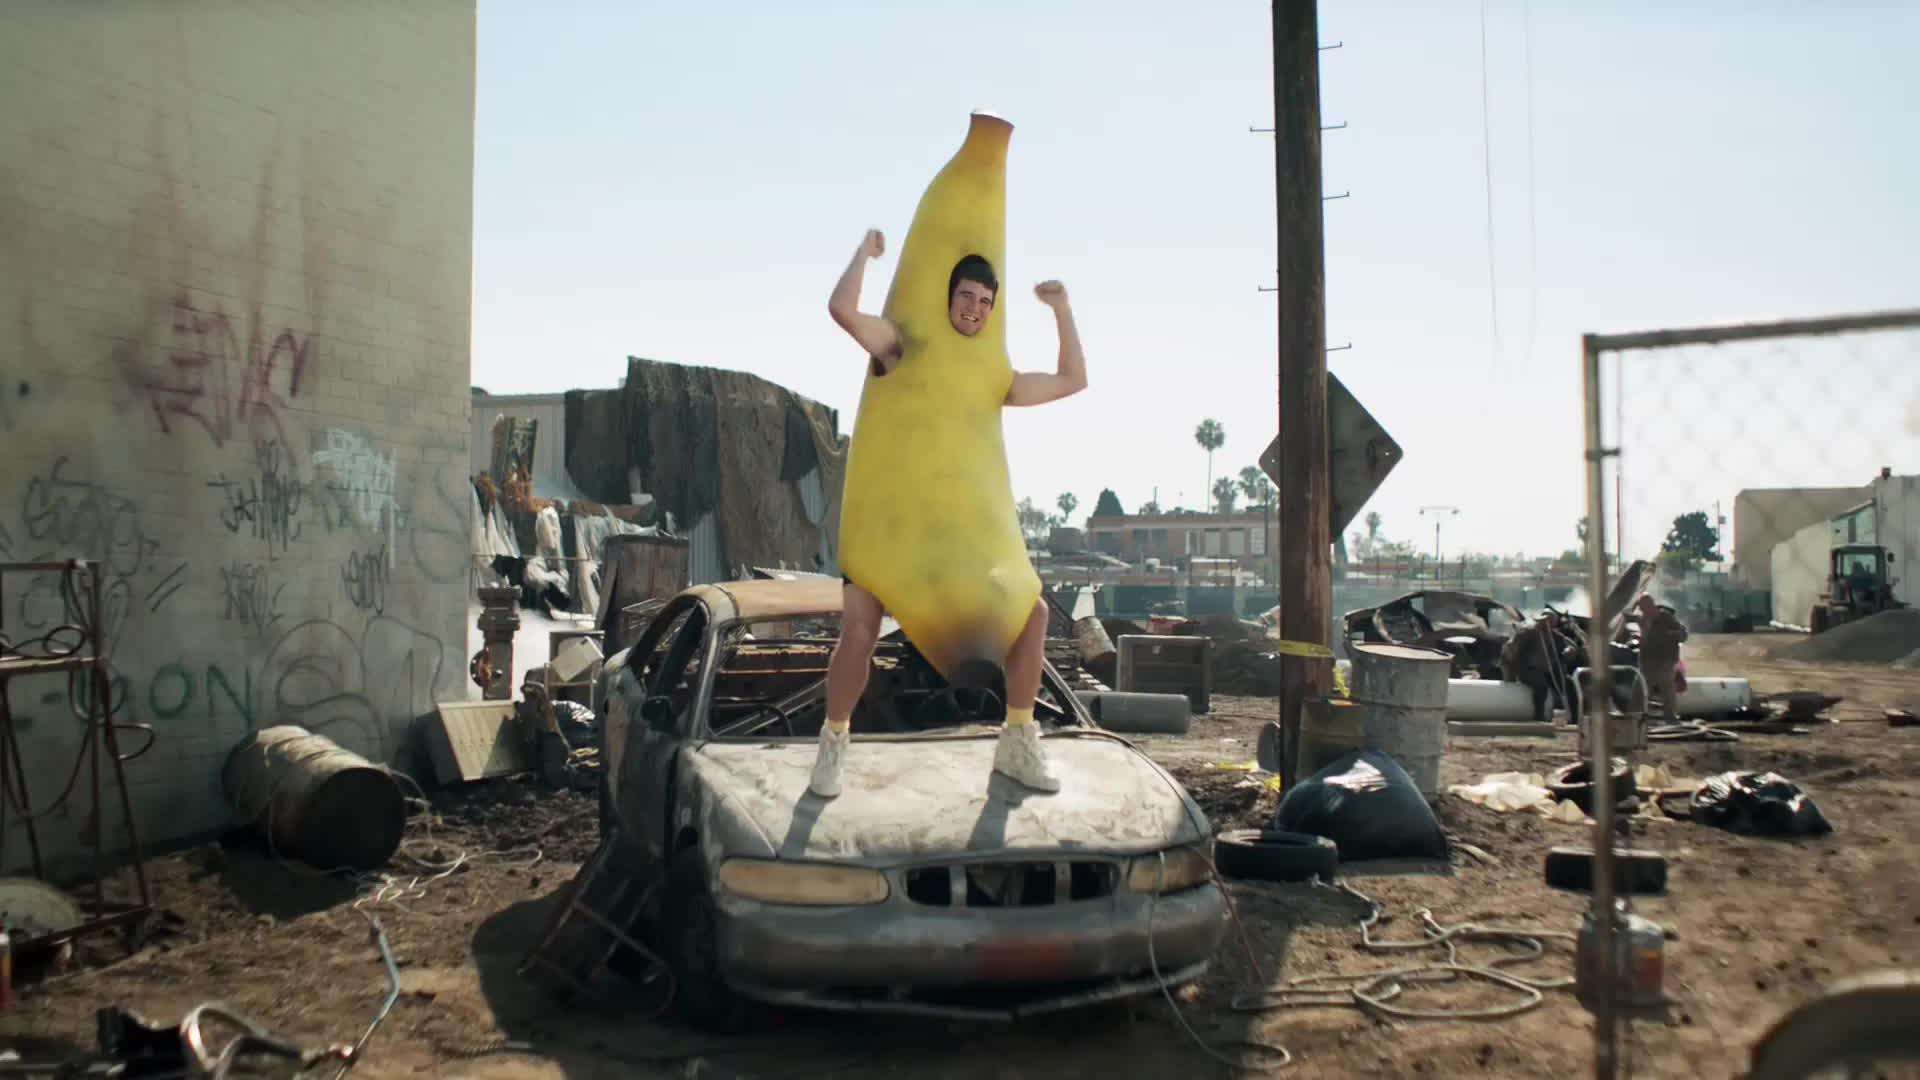 NYGiants, nfl, ELI Manning Banana GIFs